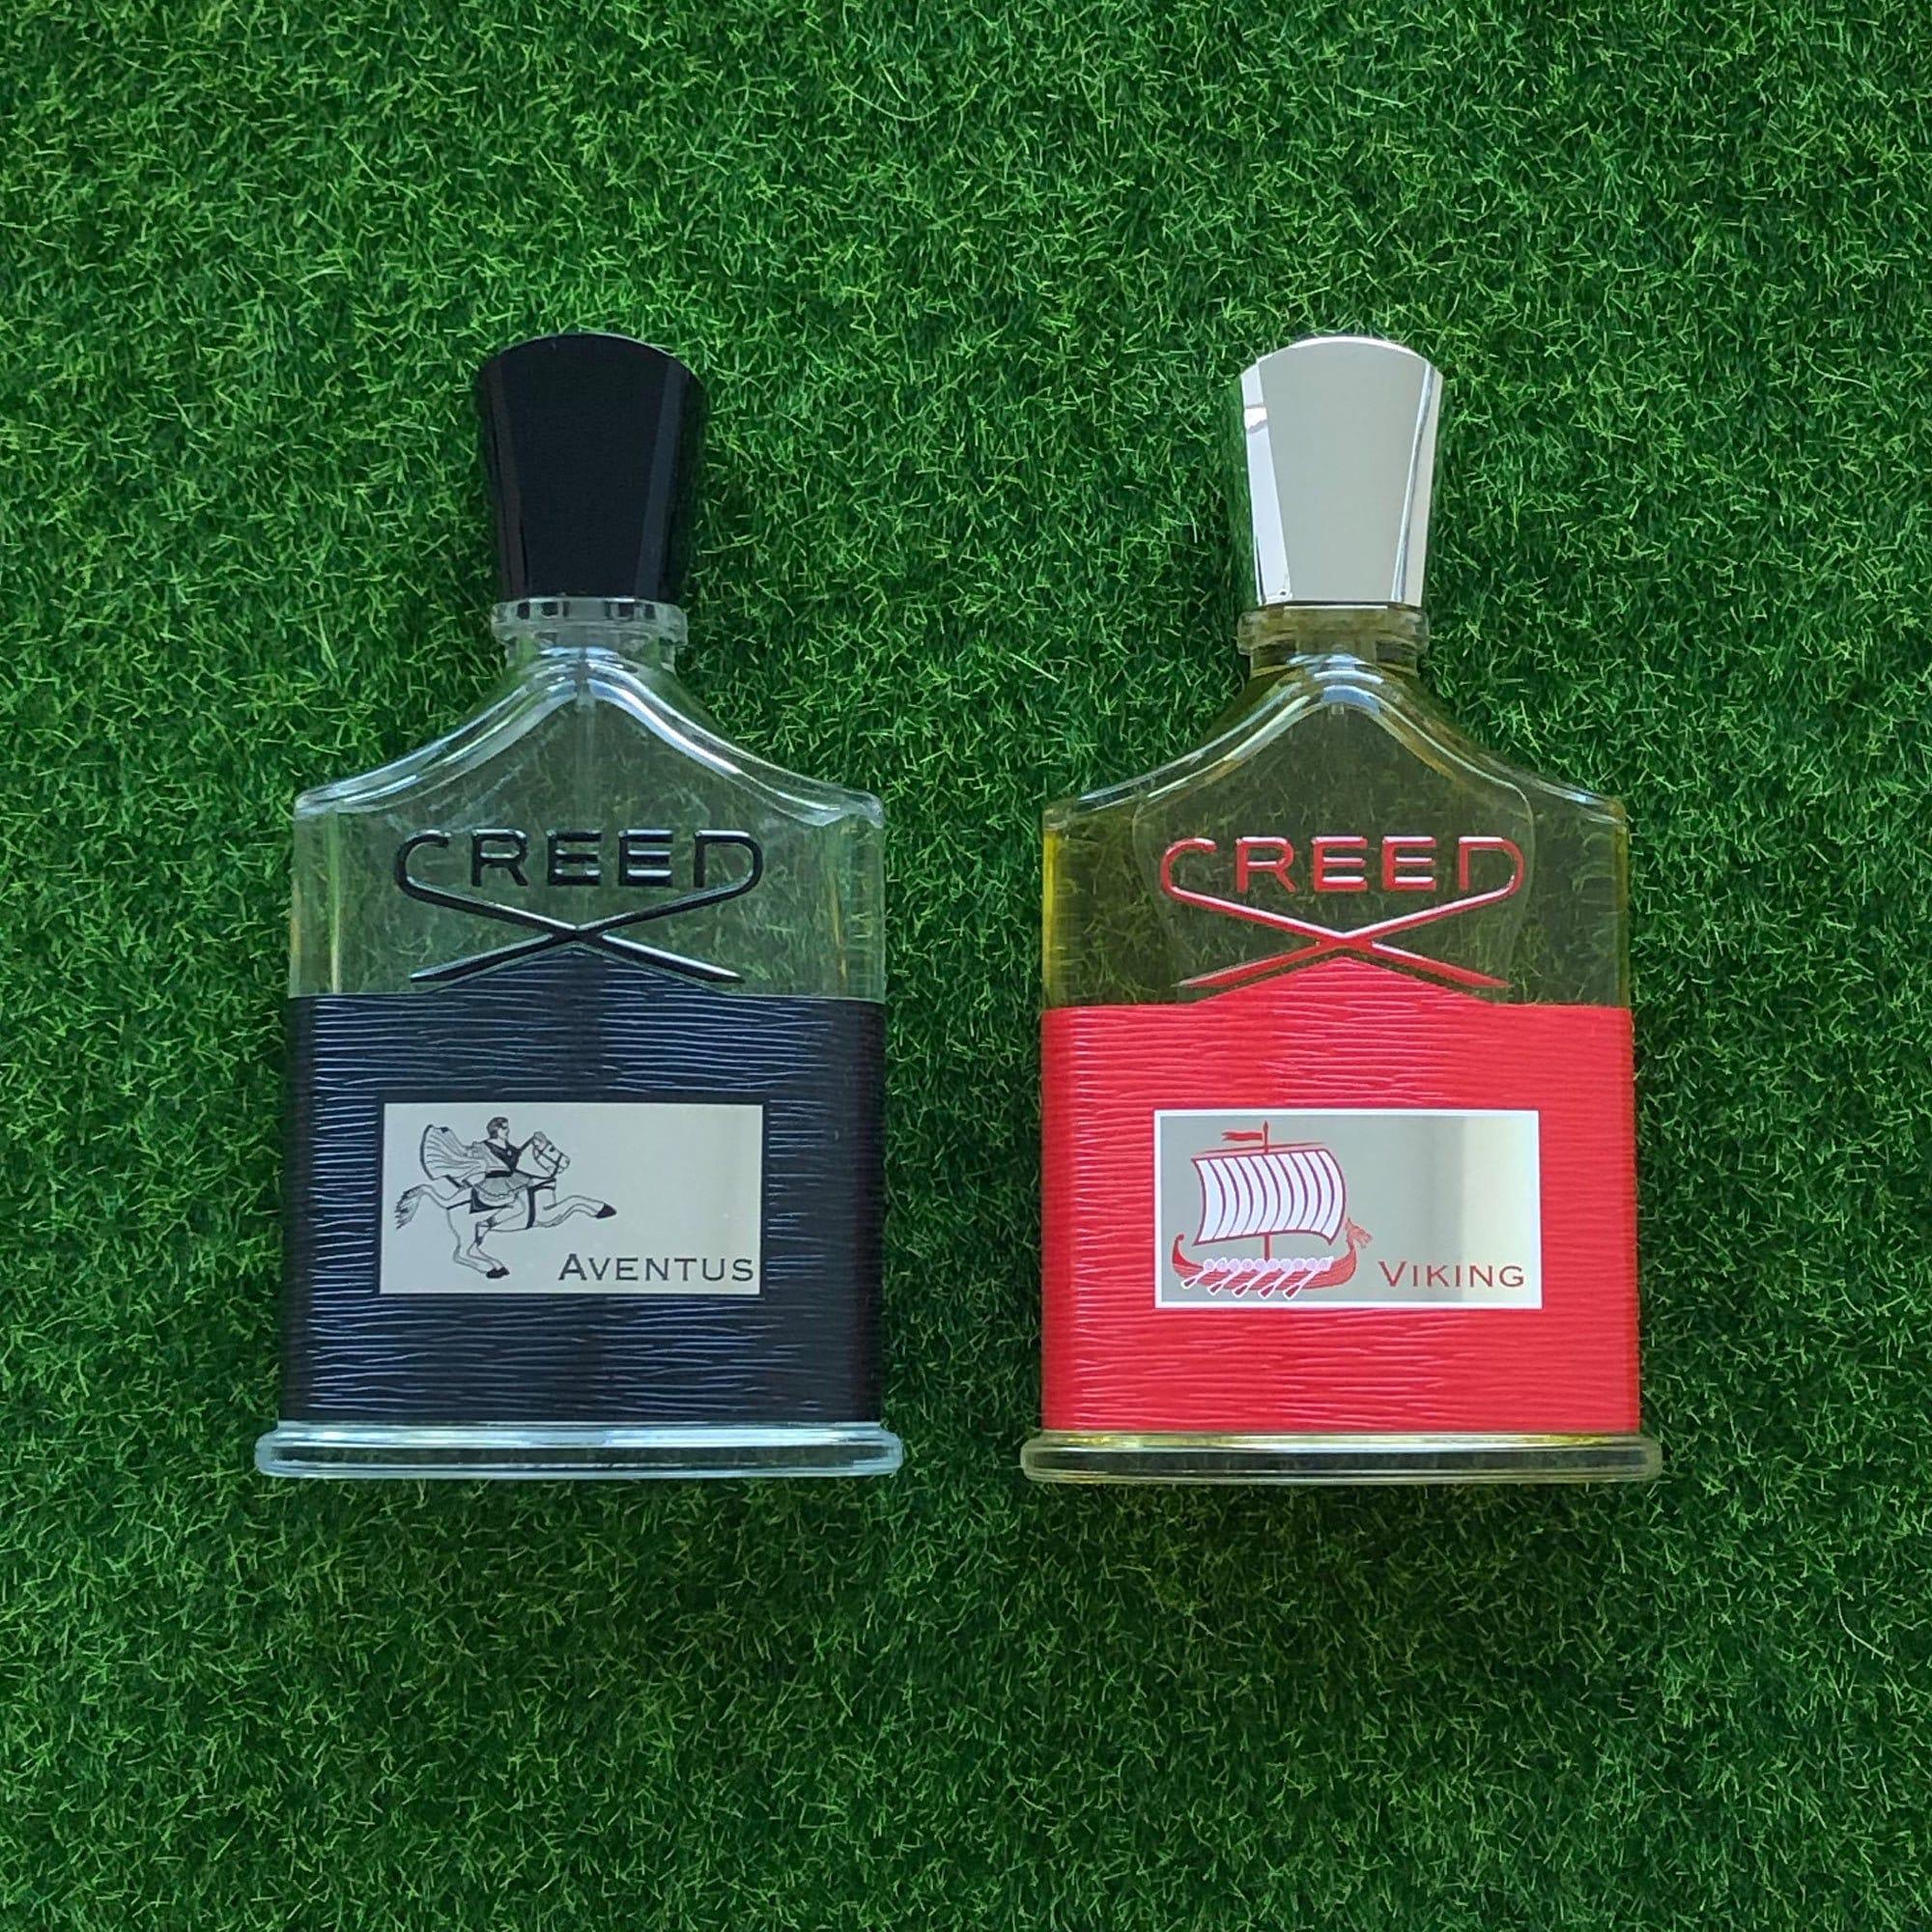 Ab 200000,200000 Euro Creed Bundle Aventus + Viking Eau de Parfum Probe/Abfüllung  20000x20000ml   20000x200ml   20000x20ml